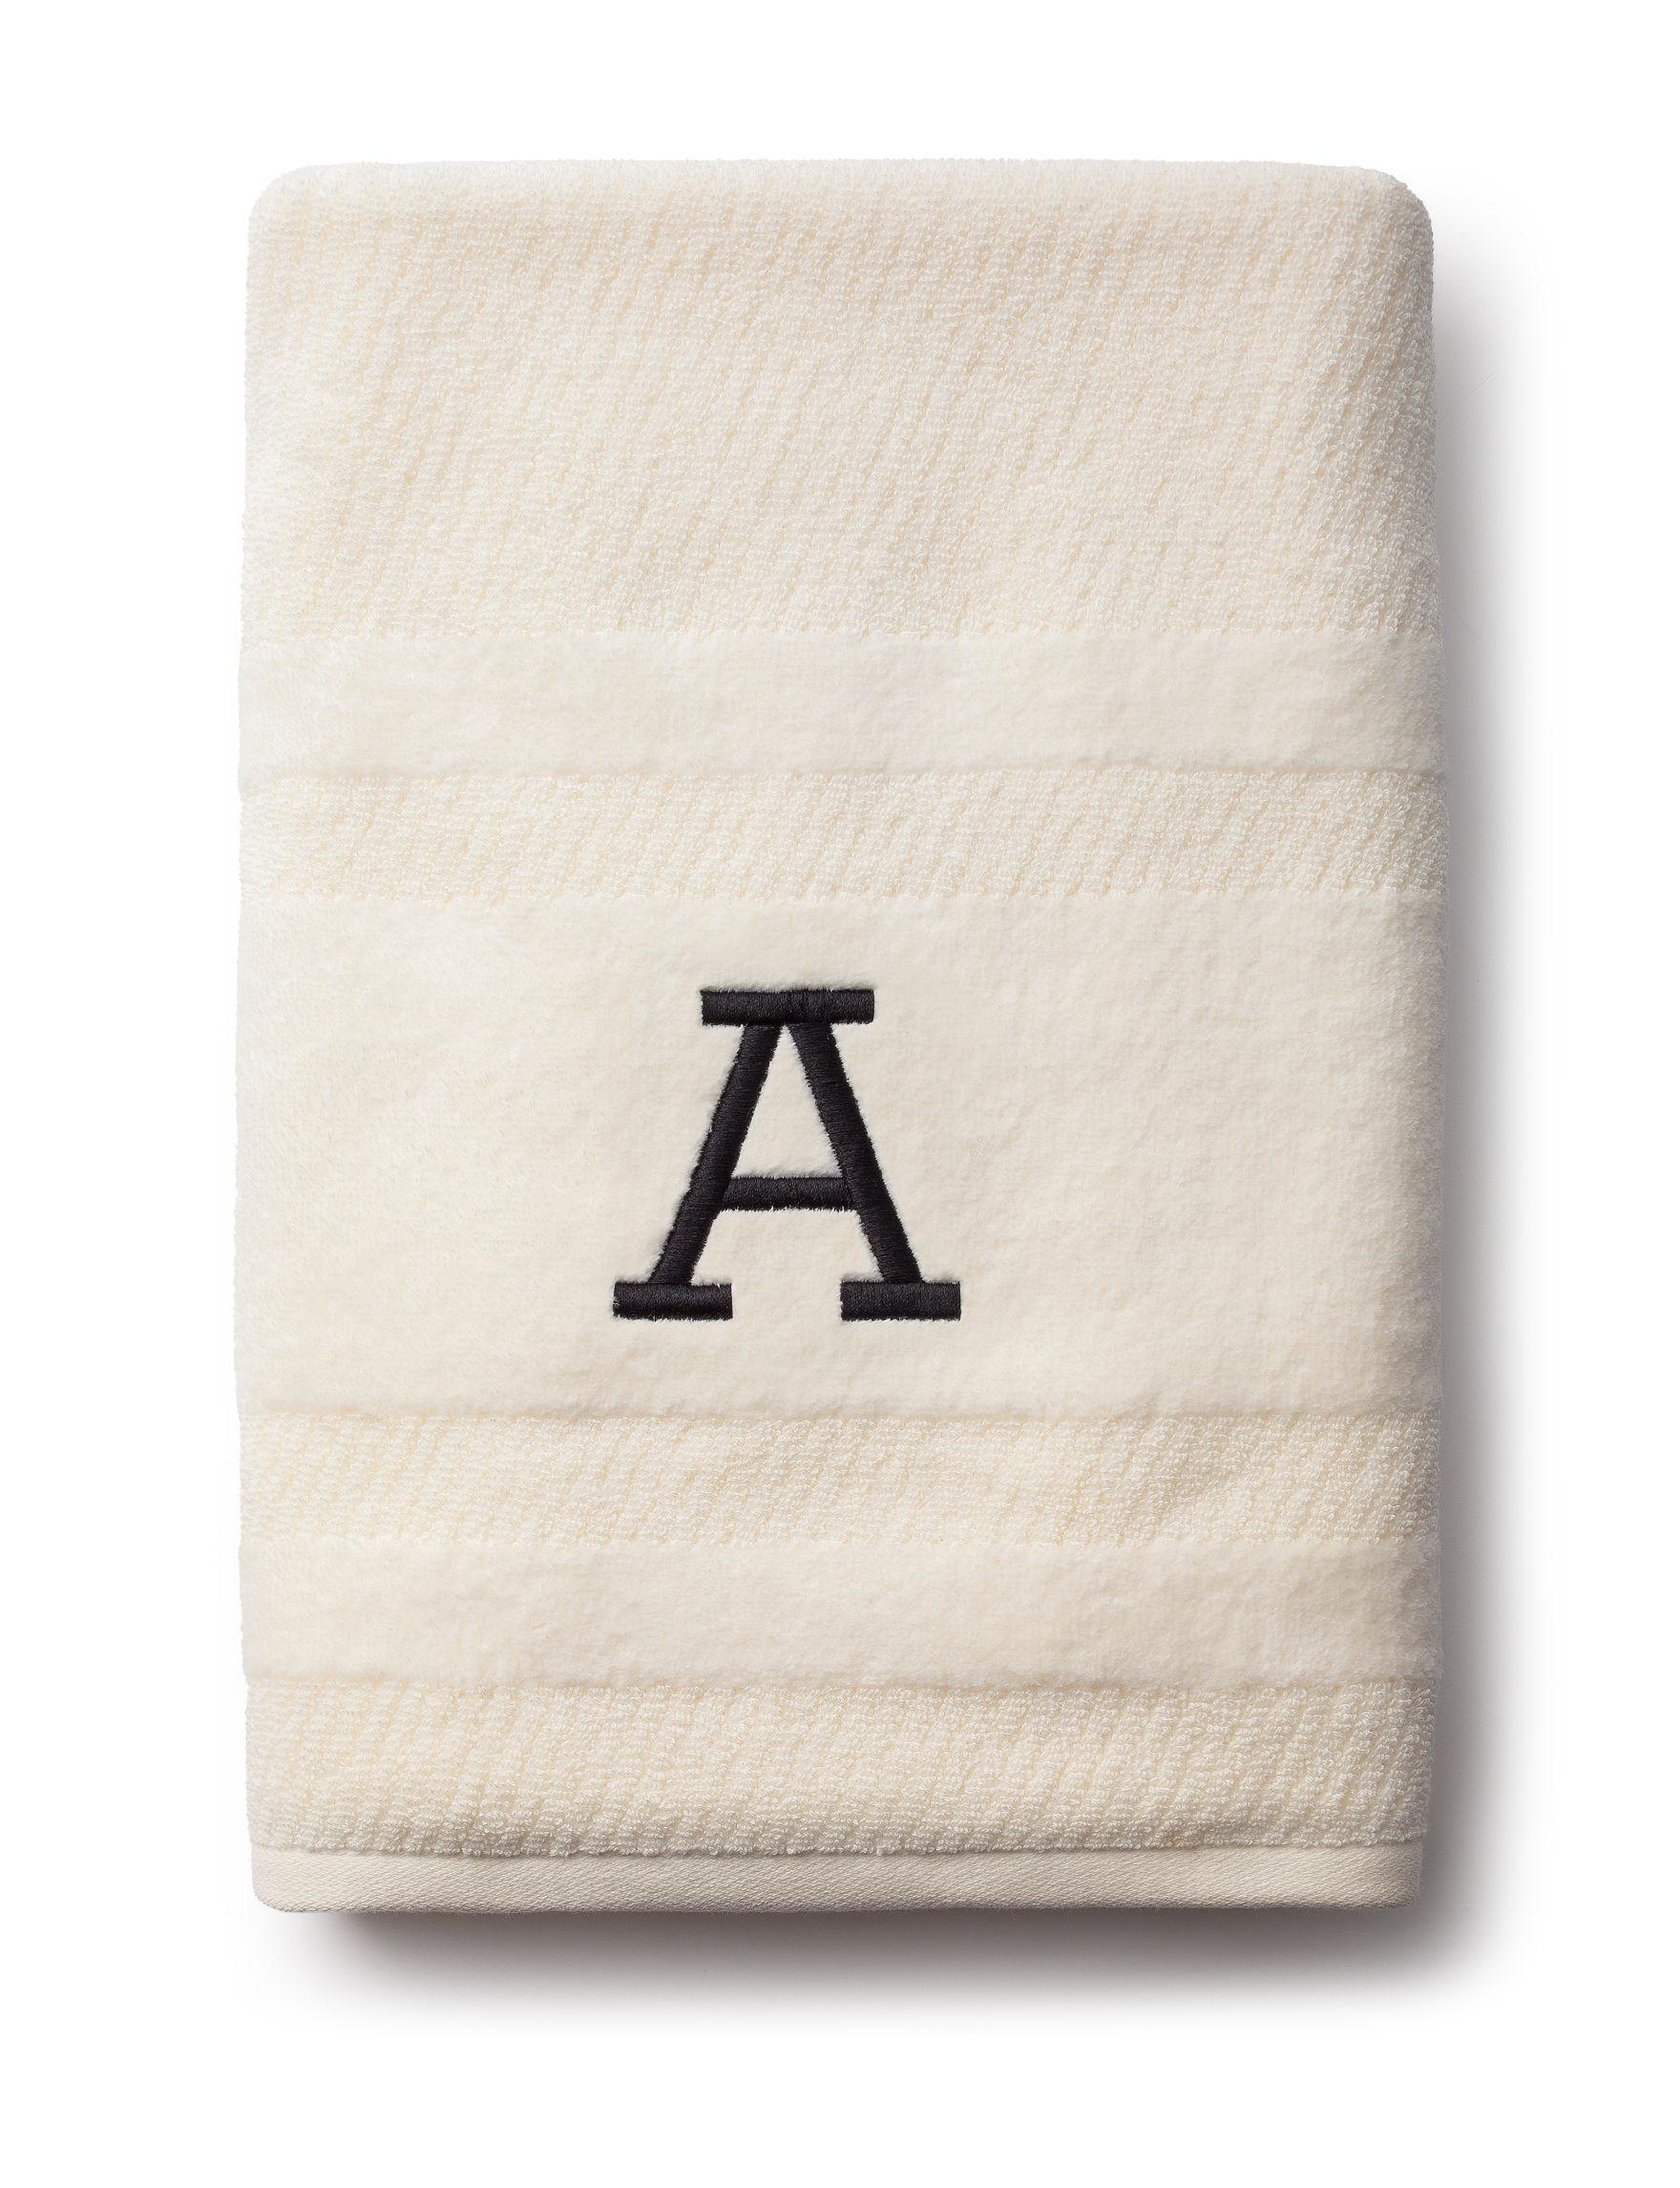 Peri Ivory Bath Towels Monogram Towels